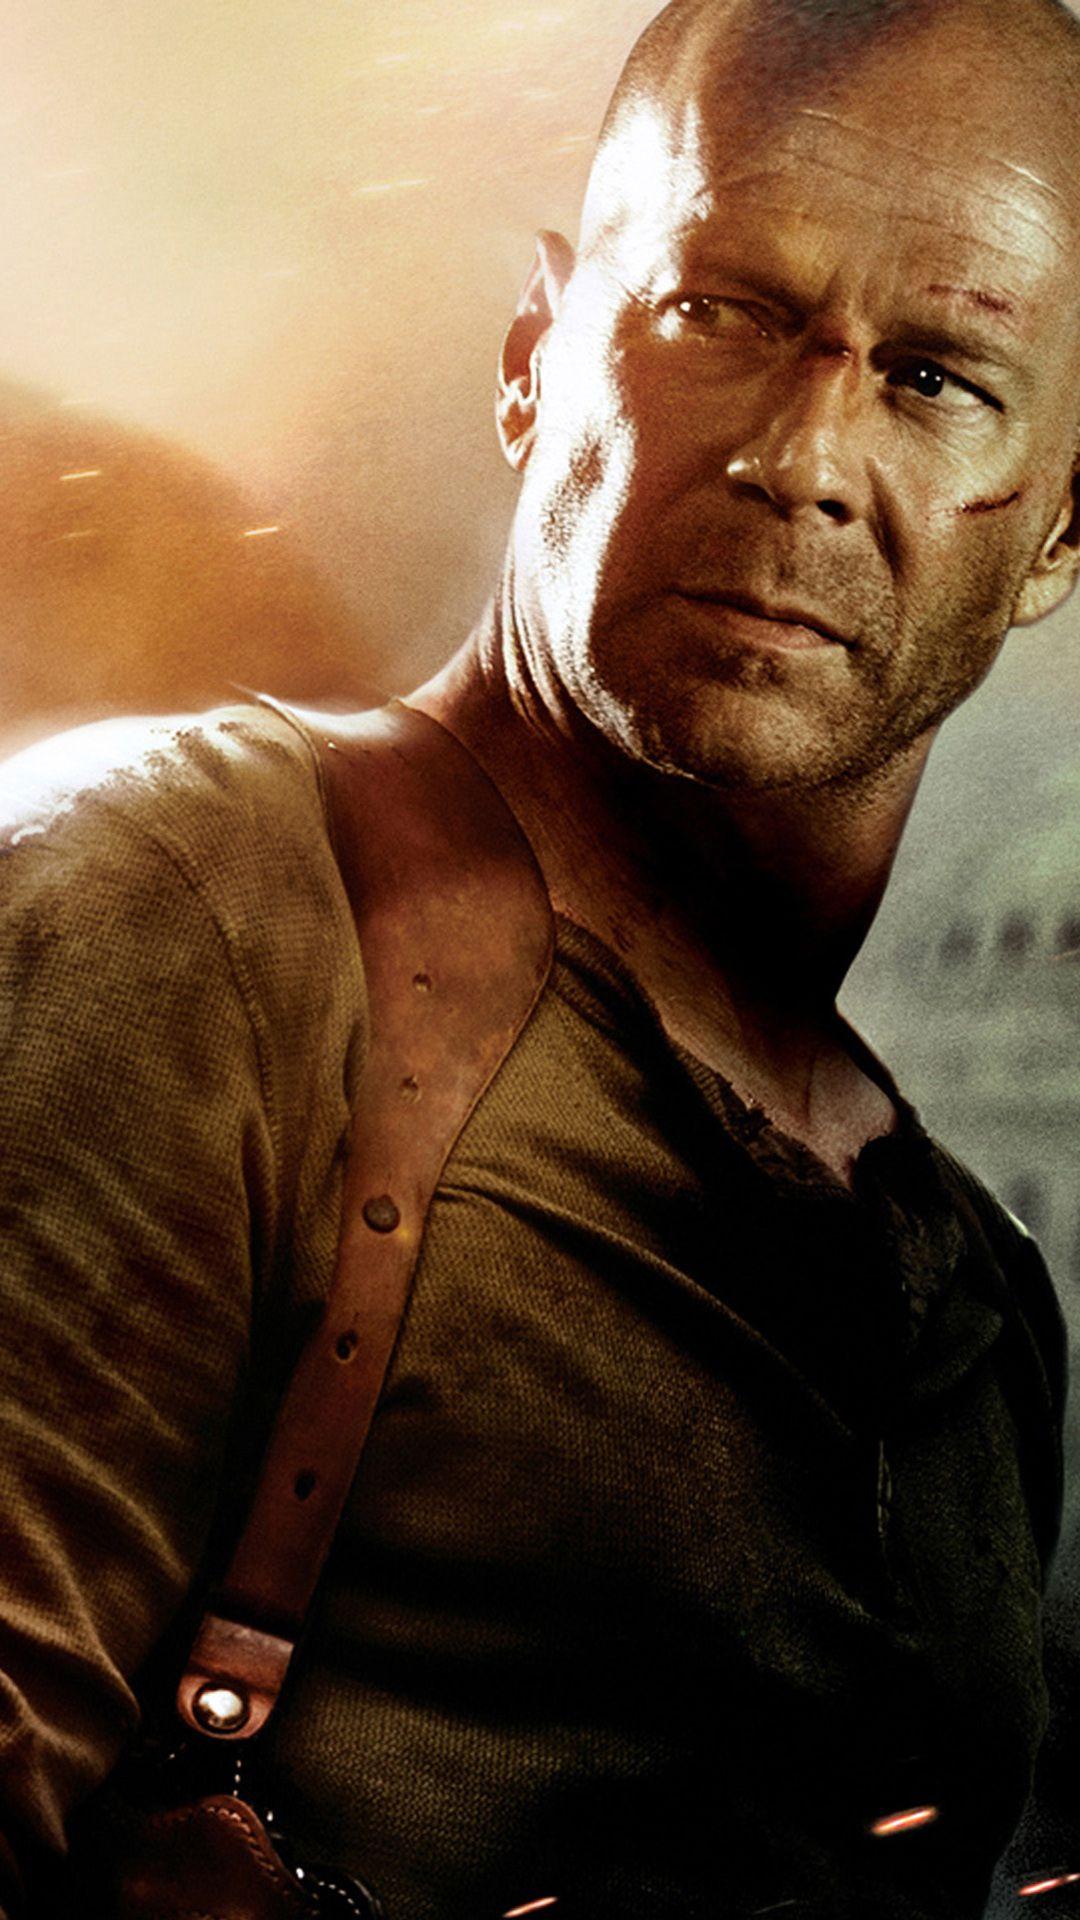 Image result for John McClane movie wallpaper